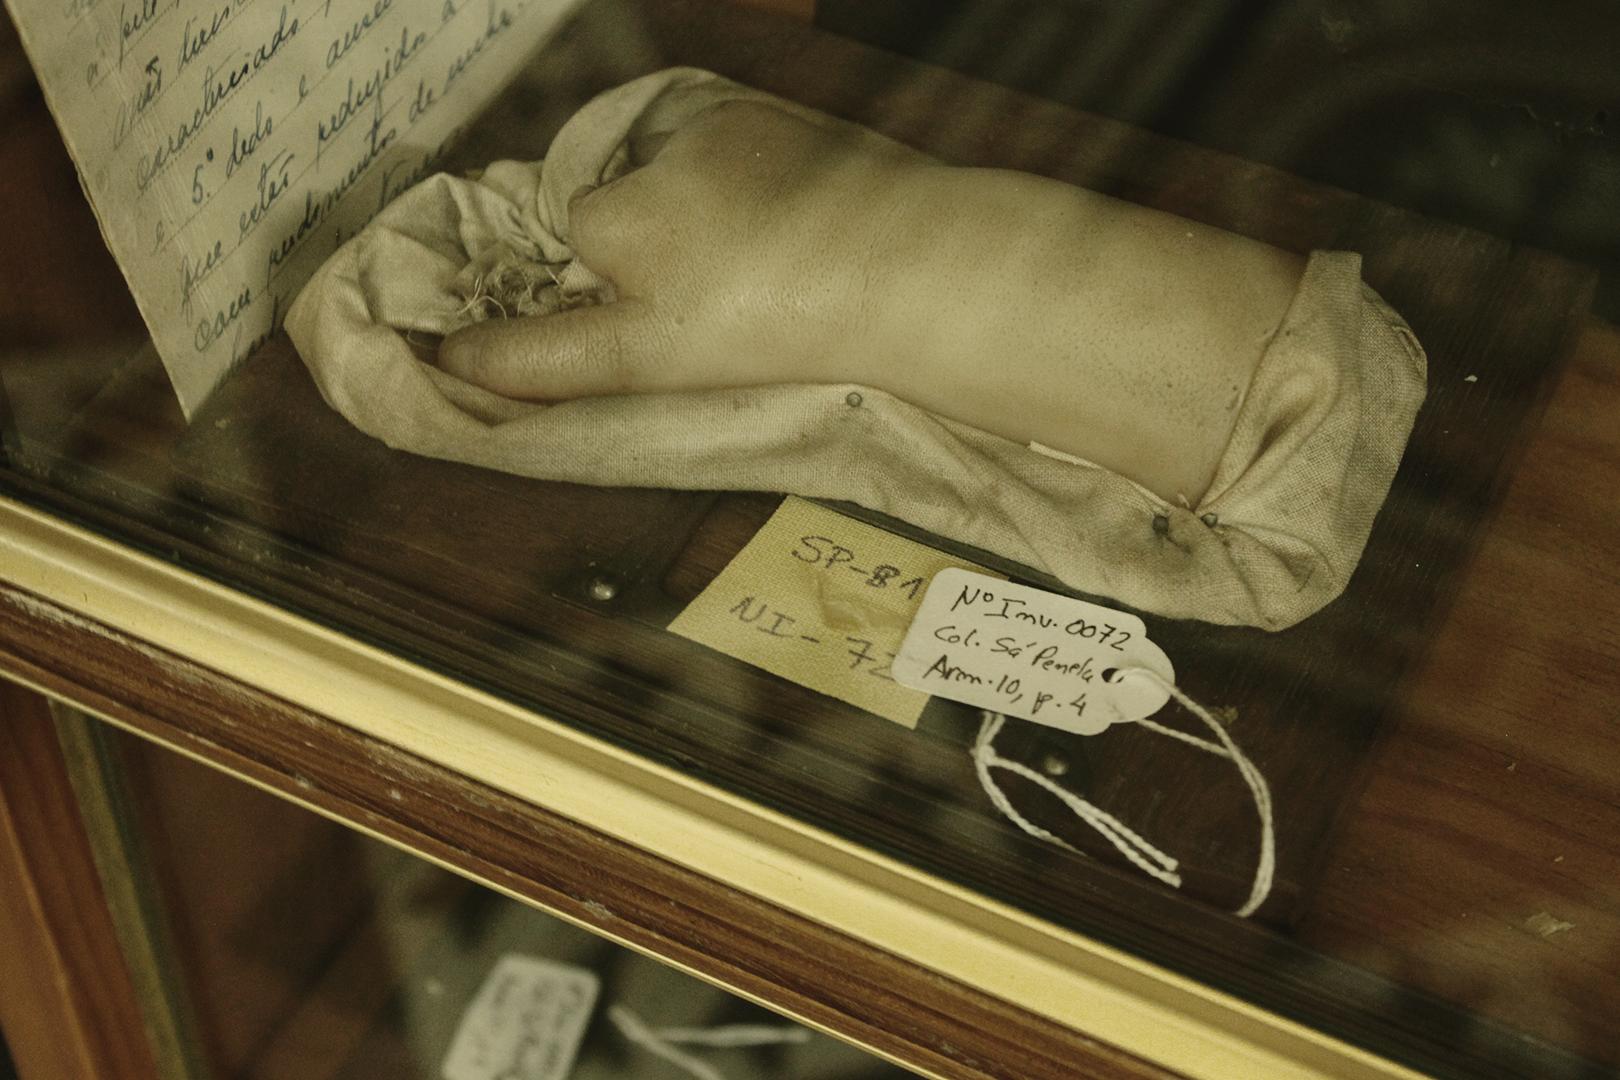 Wax model of brachydactyly, Museum of Portuguese Dermatology (Museu da Dermatologia Portuguesa).